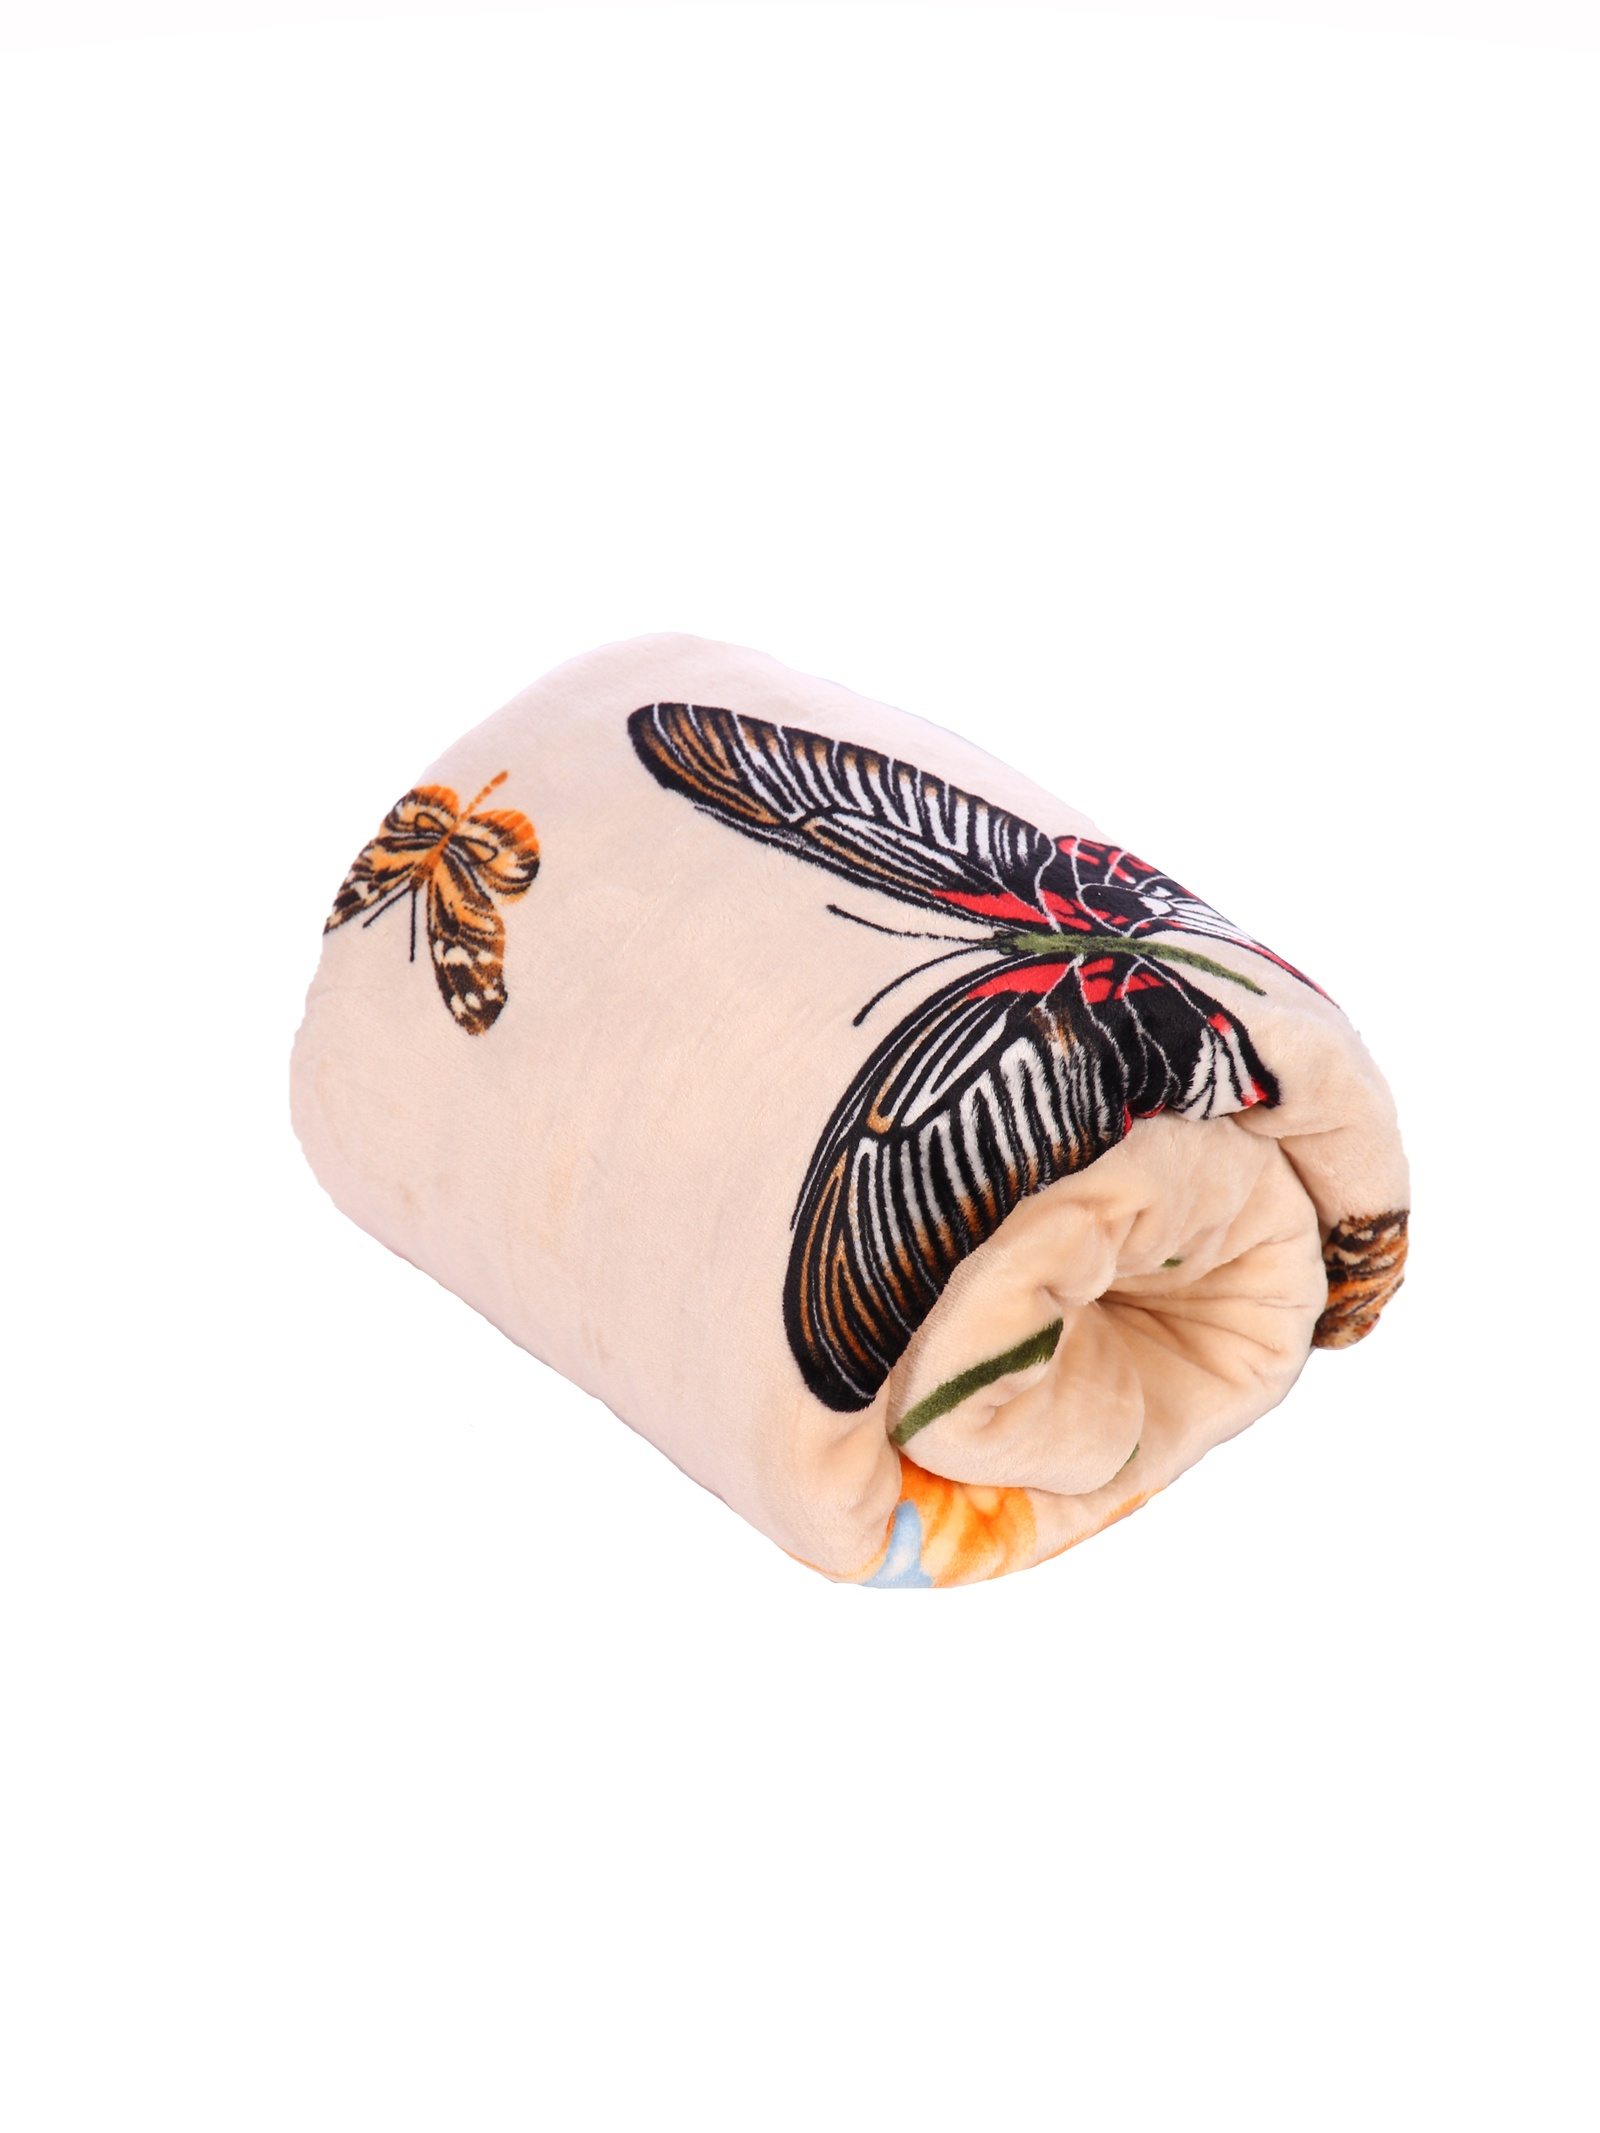 Плед world textile ВОРД-1,5сп008-10-3-0, бежевый, оранжевый, зеленый цена